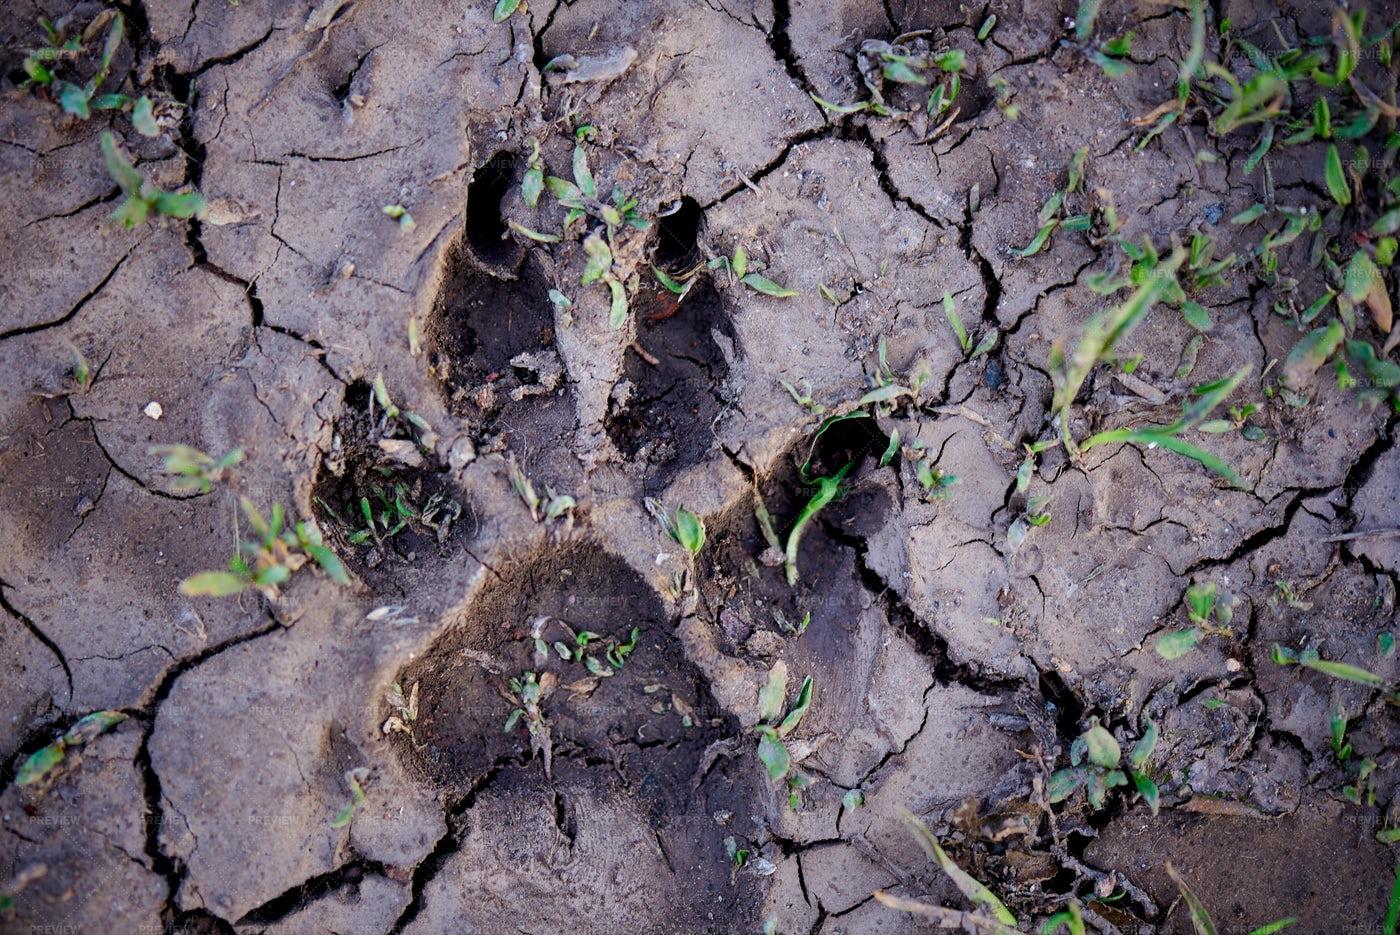 Animal Footprint In Soil: Stock Photos